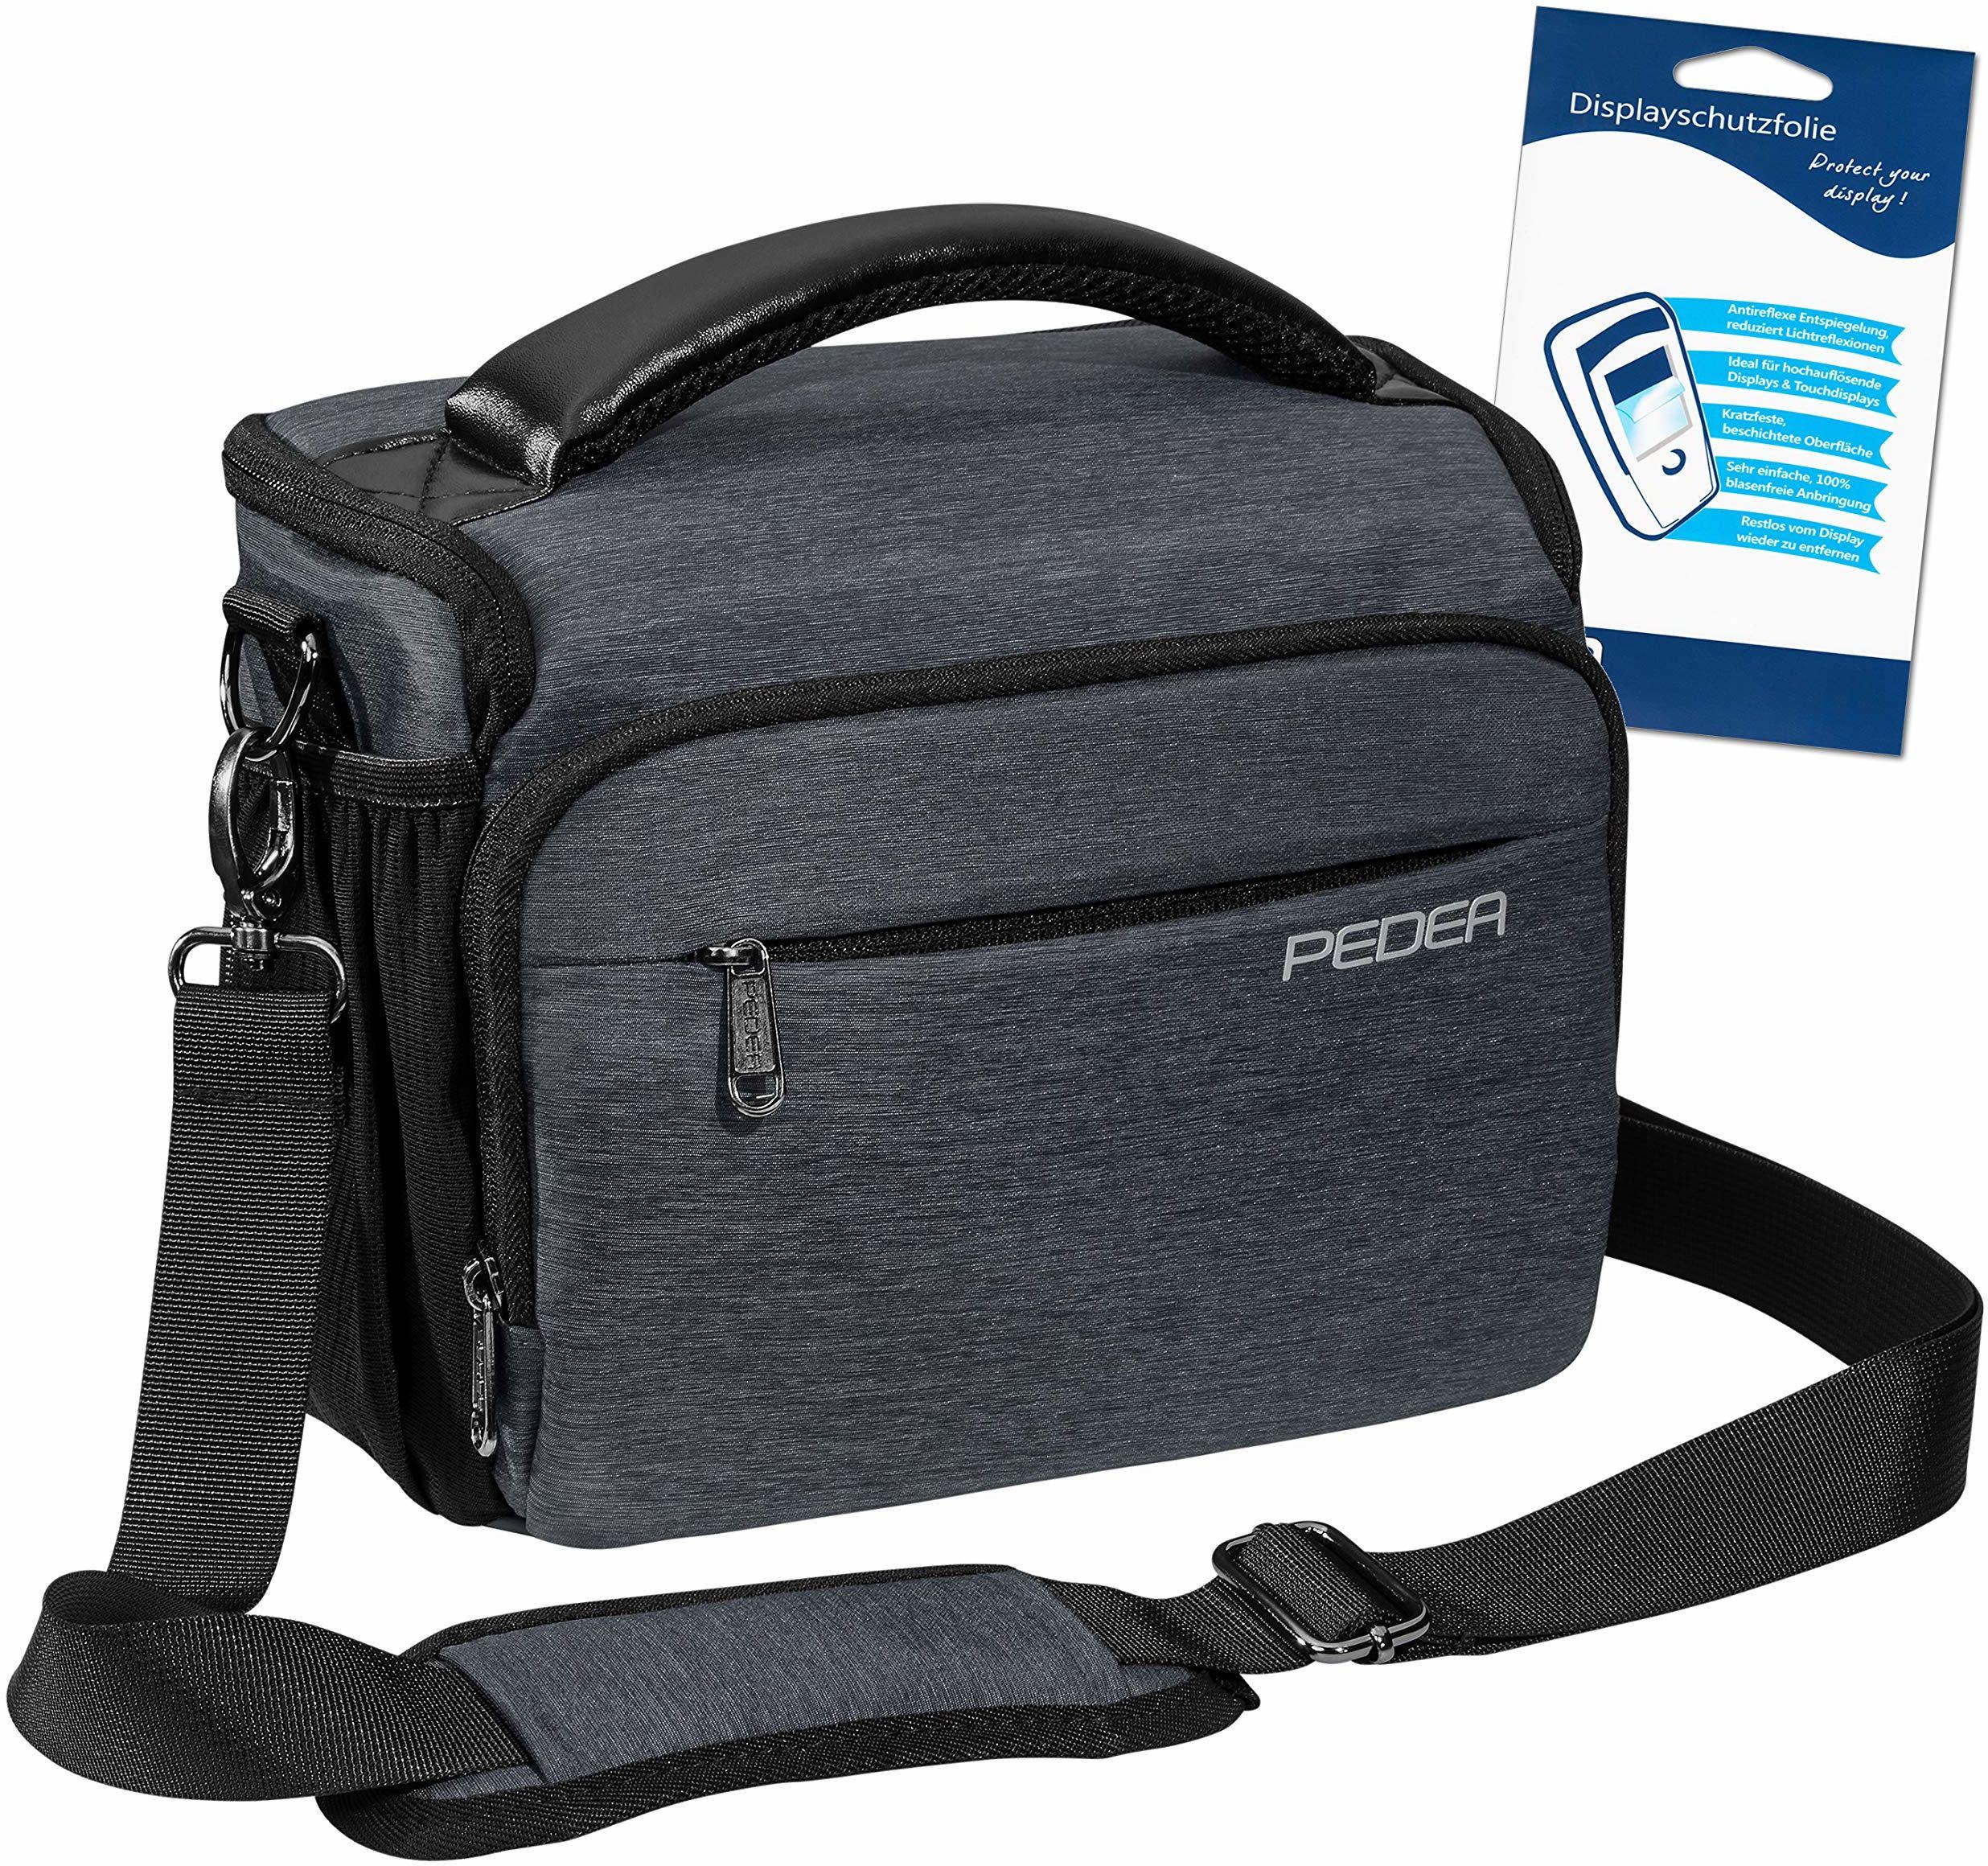 "PEDEA DSLR torba na aparat""Noble"" z folią ochronną na wyświetlacz do Canon EOS 5D Mark II 400D 2000D / Nikon D60 D80 D90 D3100 D3200 D3300 D3400 D5300 D7100 / Pentax K 30 K 500 K, rozm. XL szary"